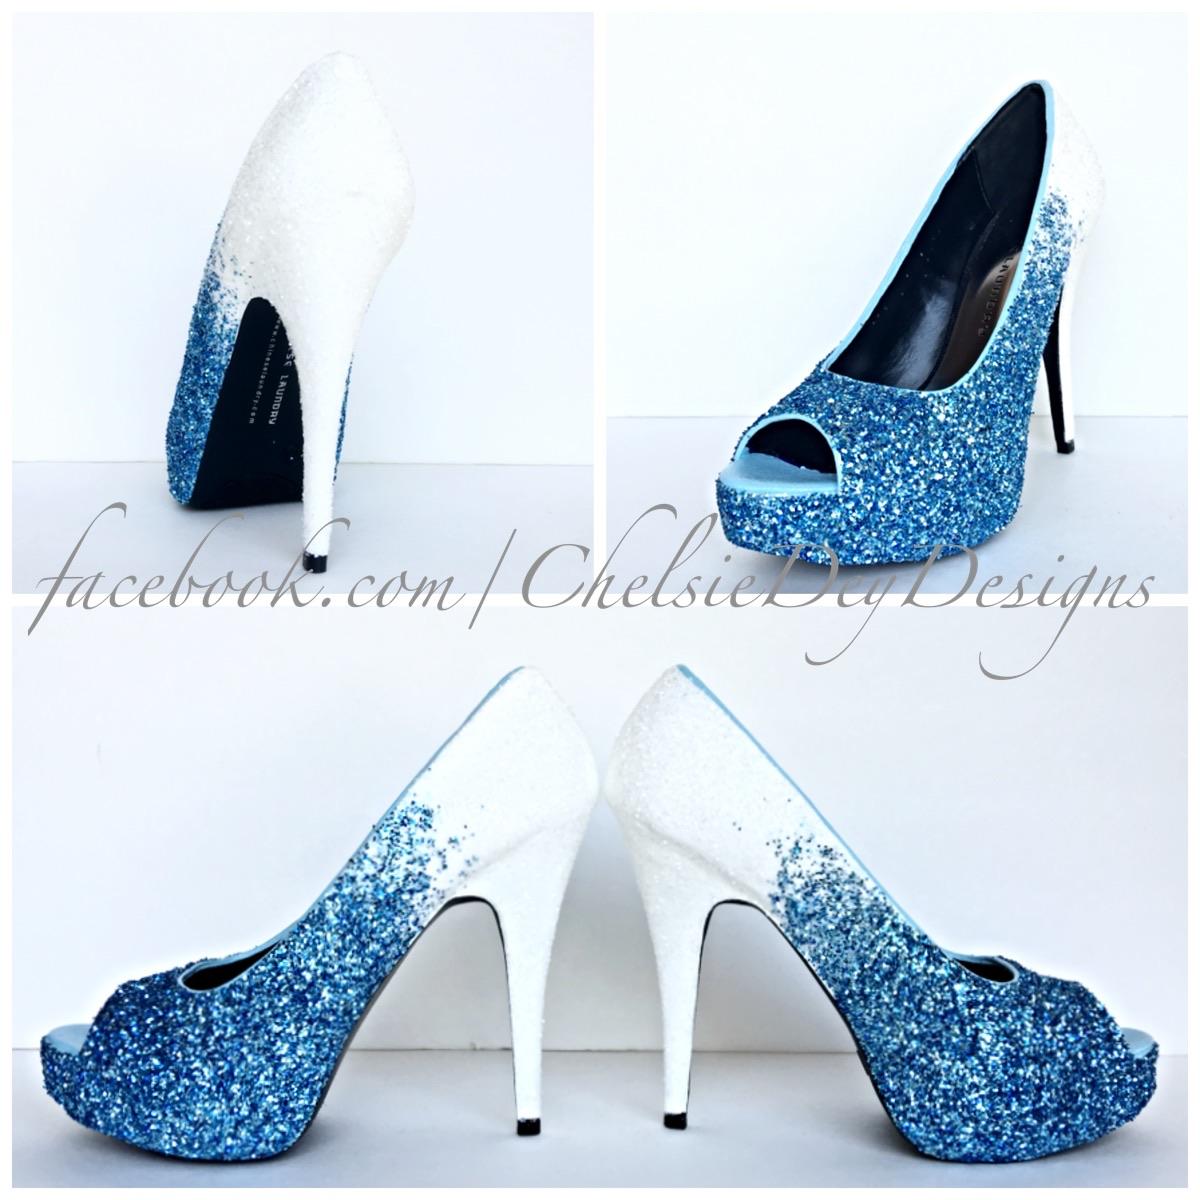 Glitter High Heels - Ocean Blue White Ombre - Peep Toe Pumps - Blue Wedding Shoes - Open Toe Platform Pumps